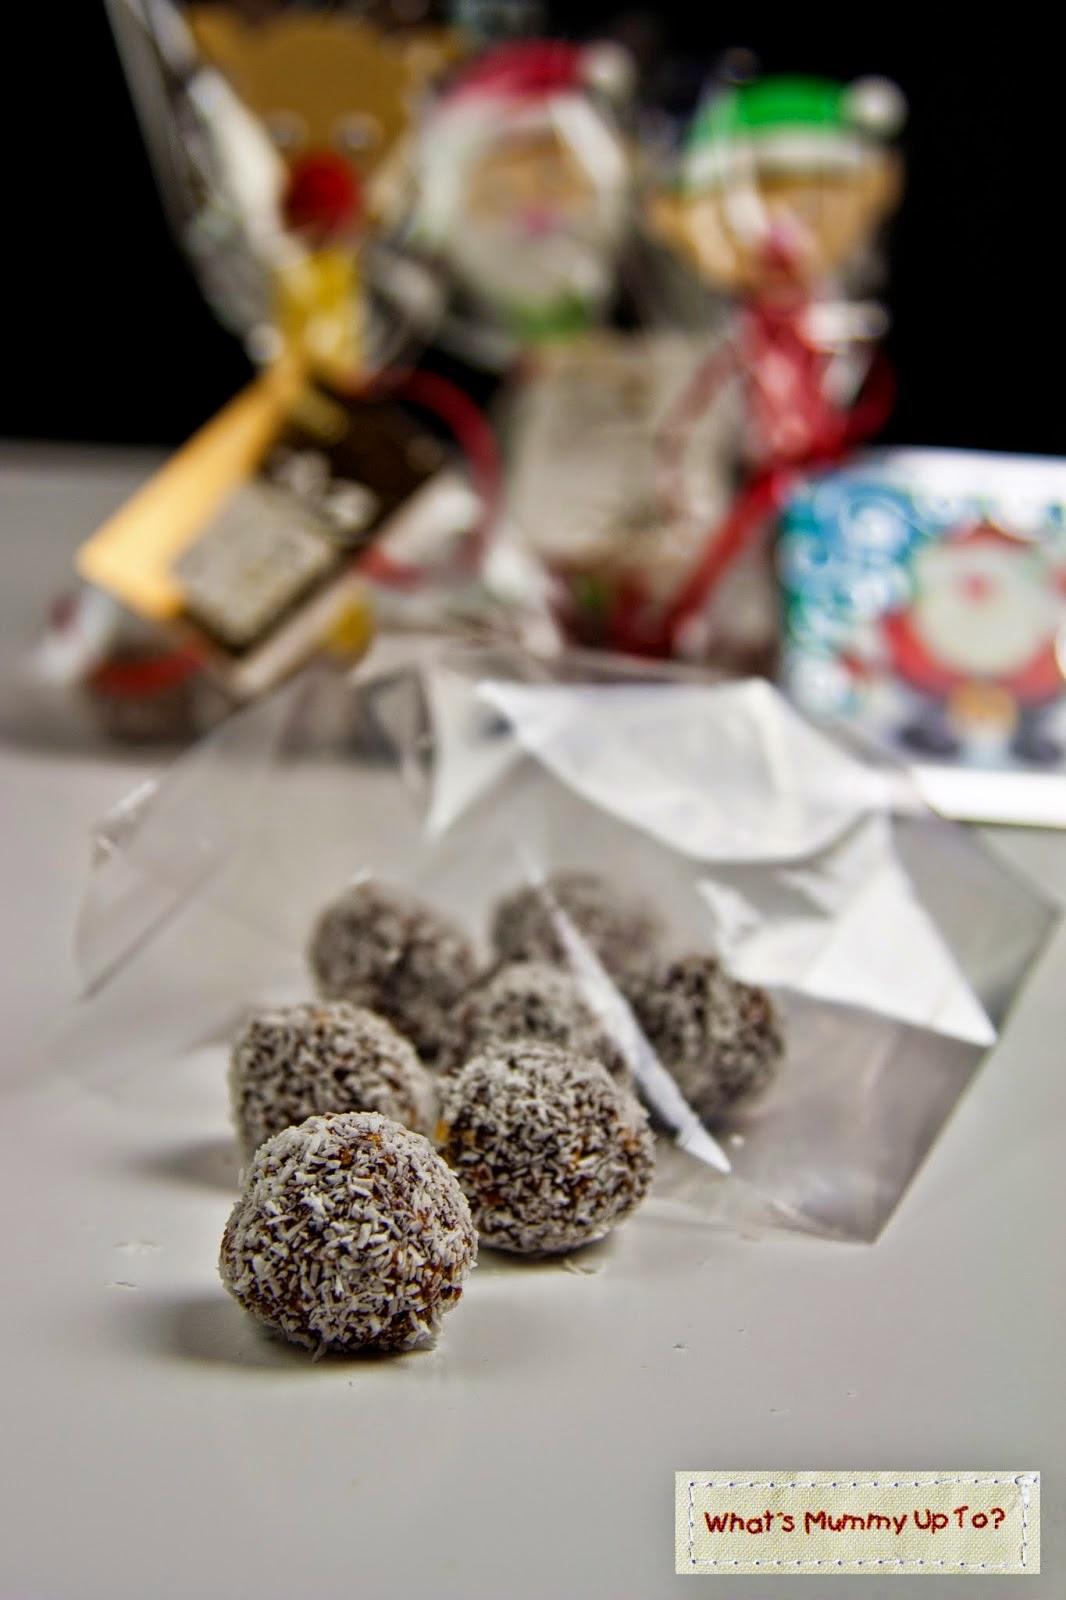 http://whatsmummyupto.blogspot.com.au/2014/12/recipe-chocolate-truffle-balls.html